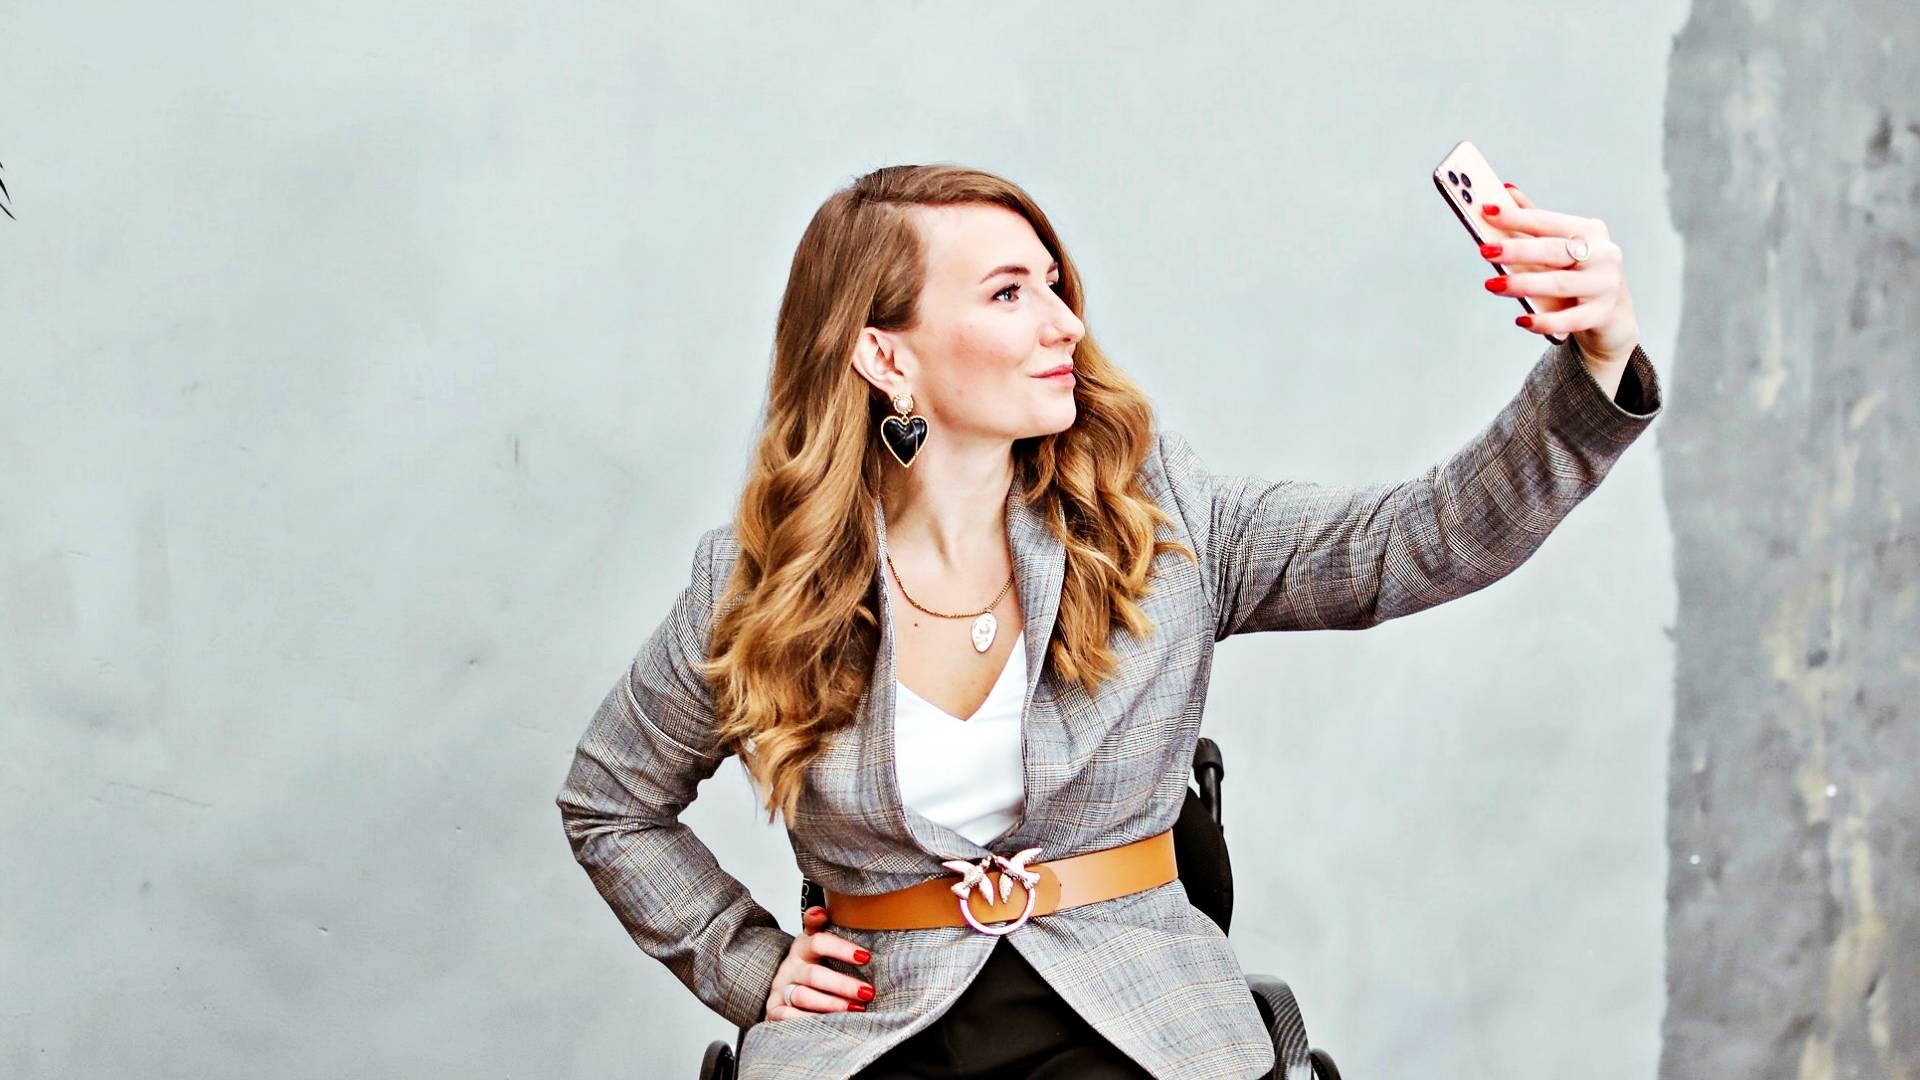 szelfi selfie bankszamlanyitas kh granit cib bank